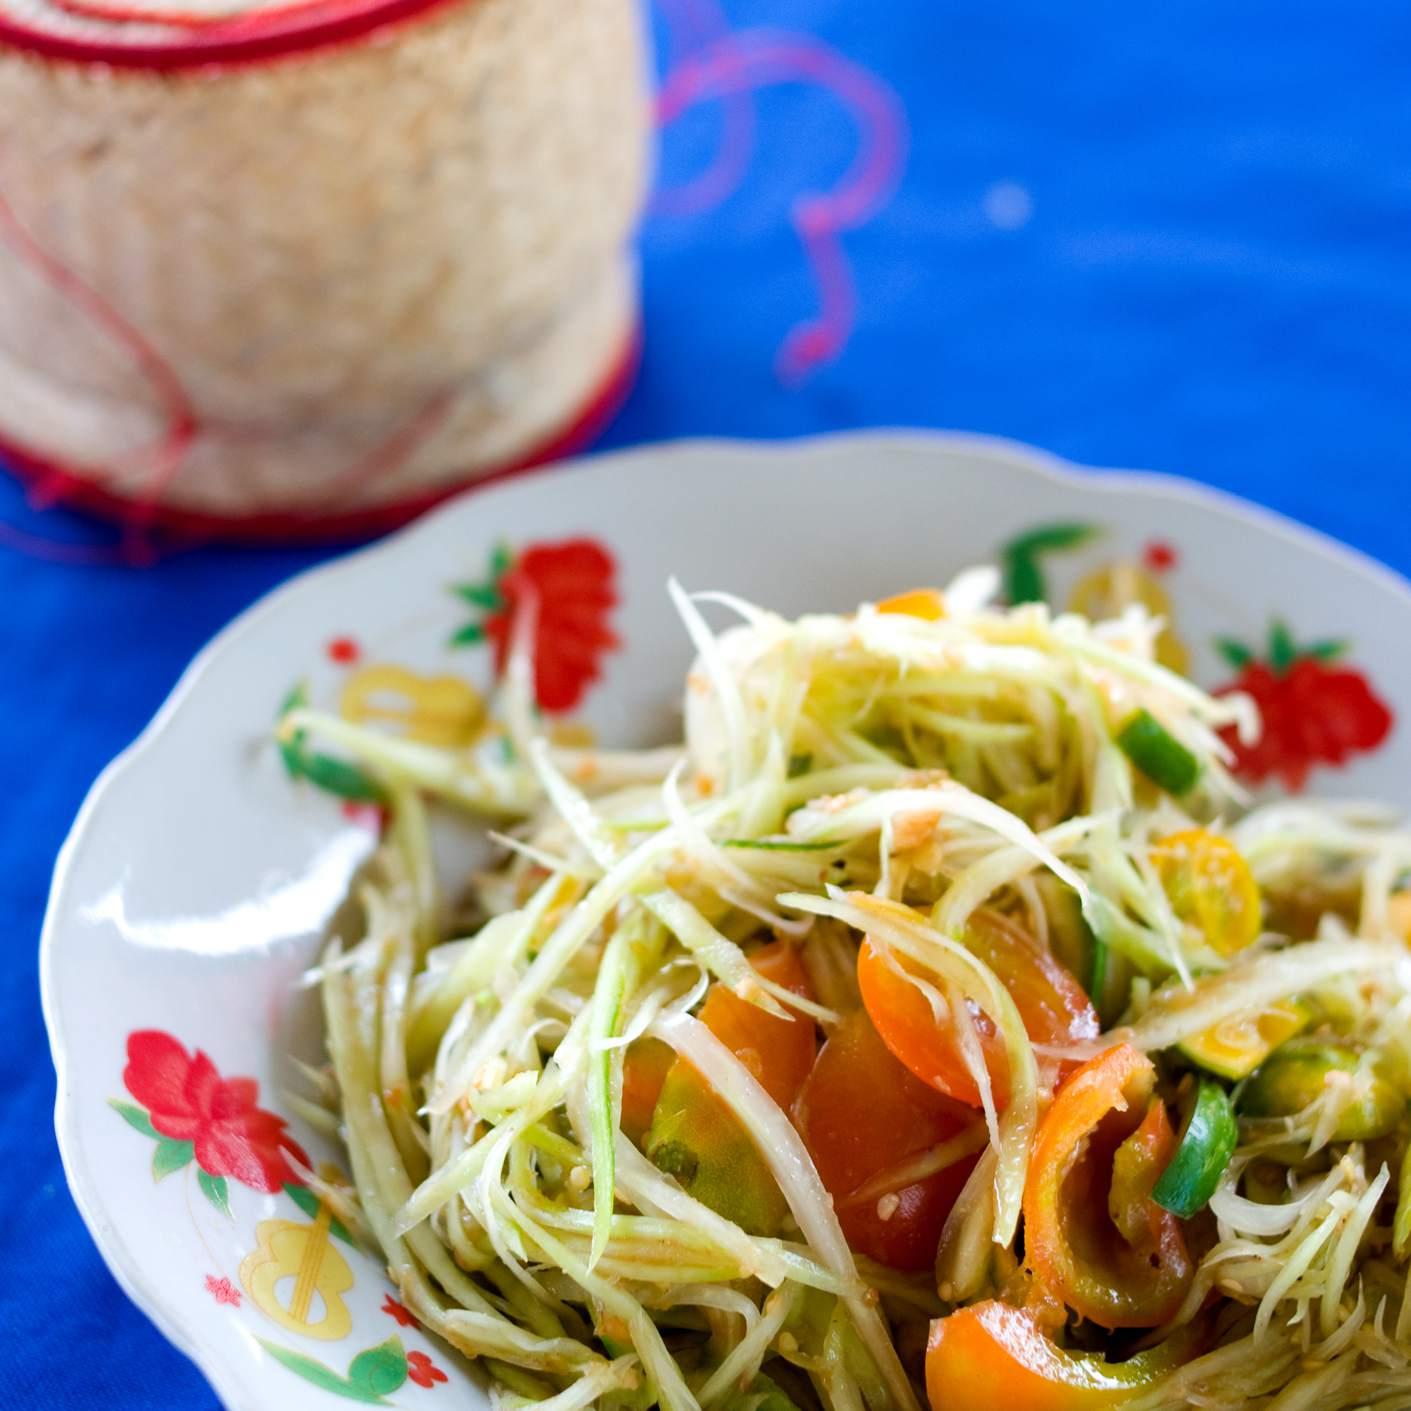 Papaya salad and basket of sticky rice at restaurant.